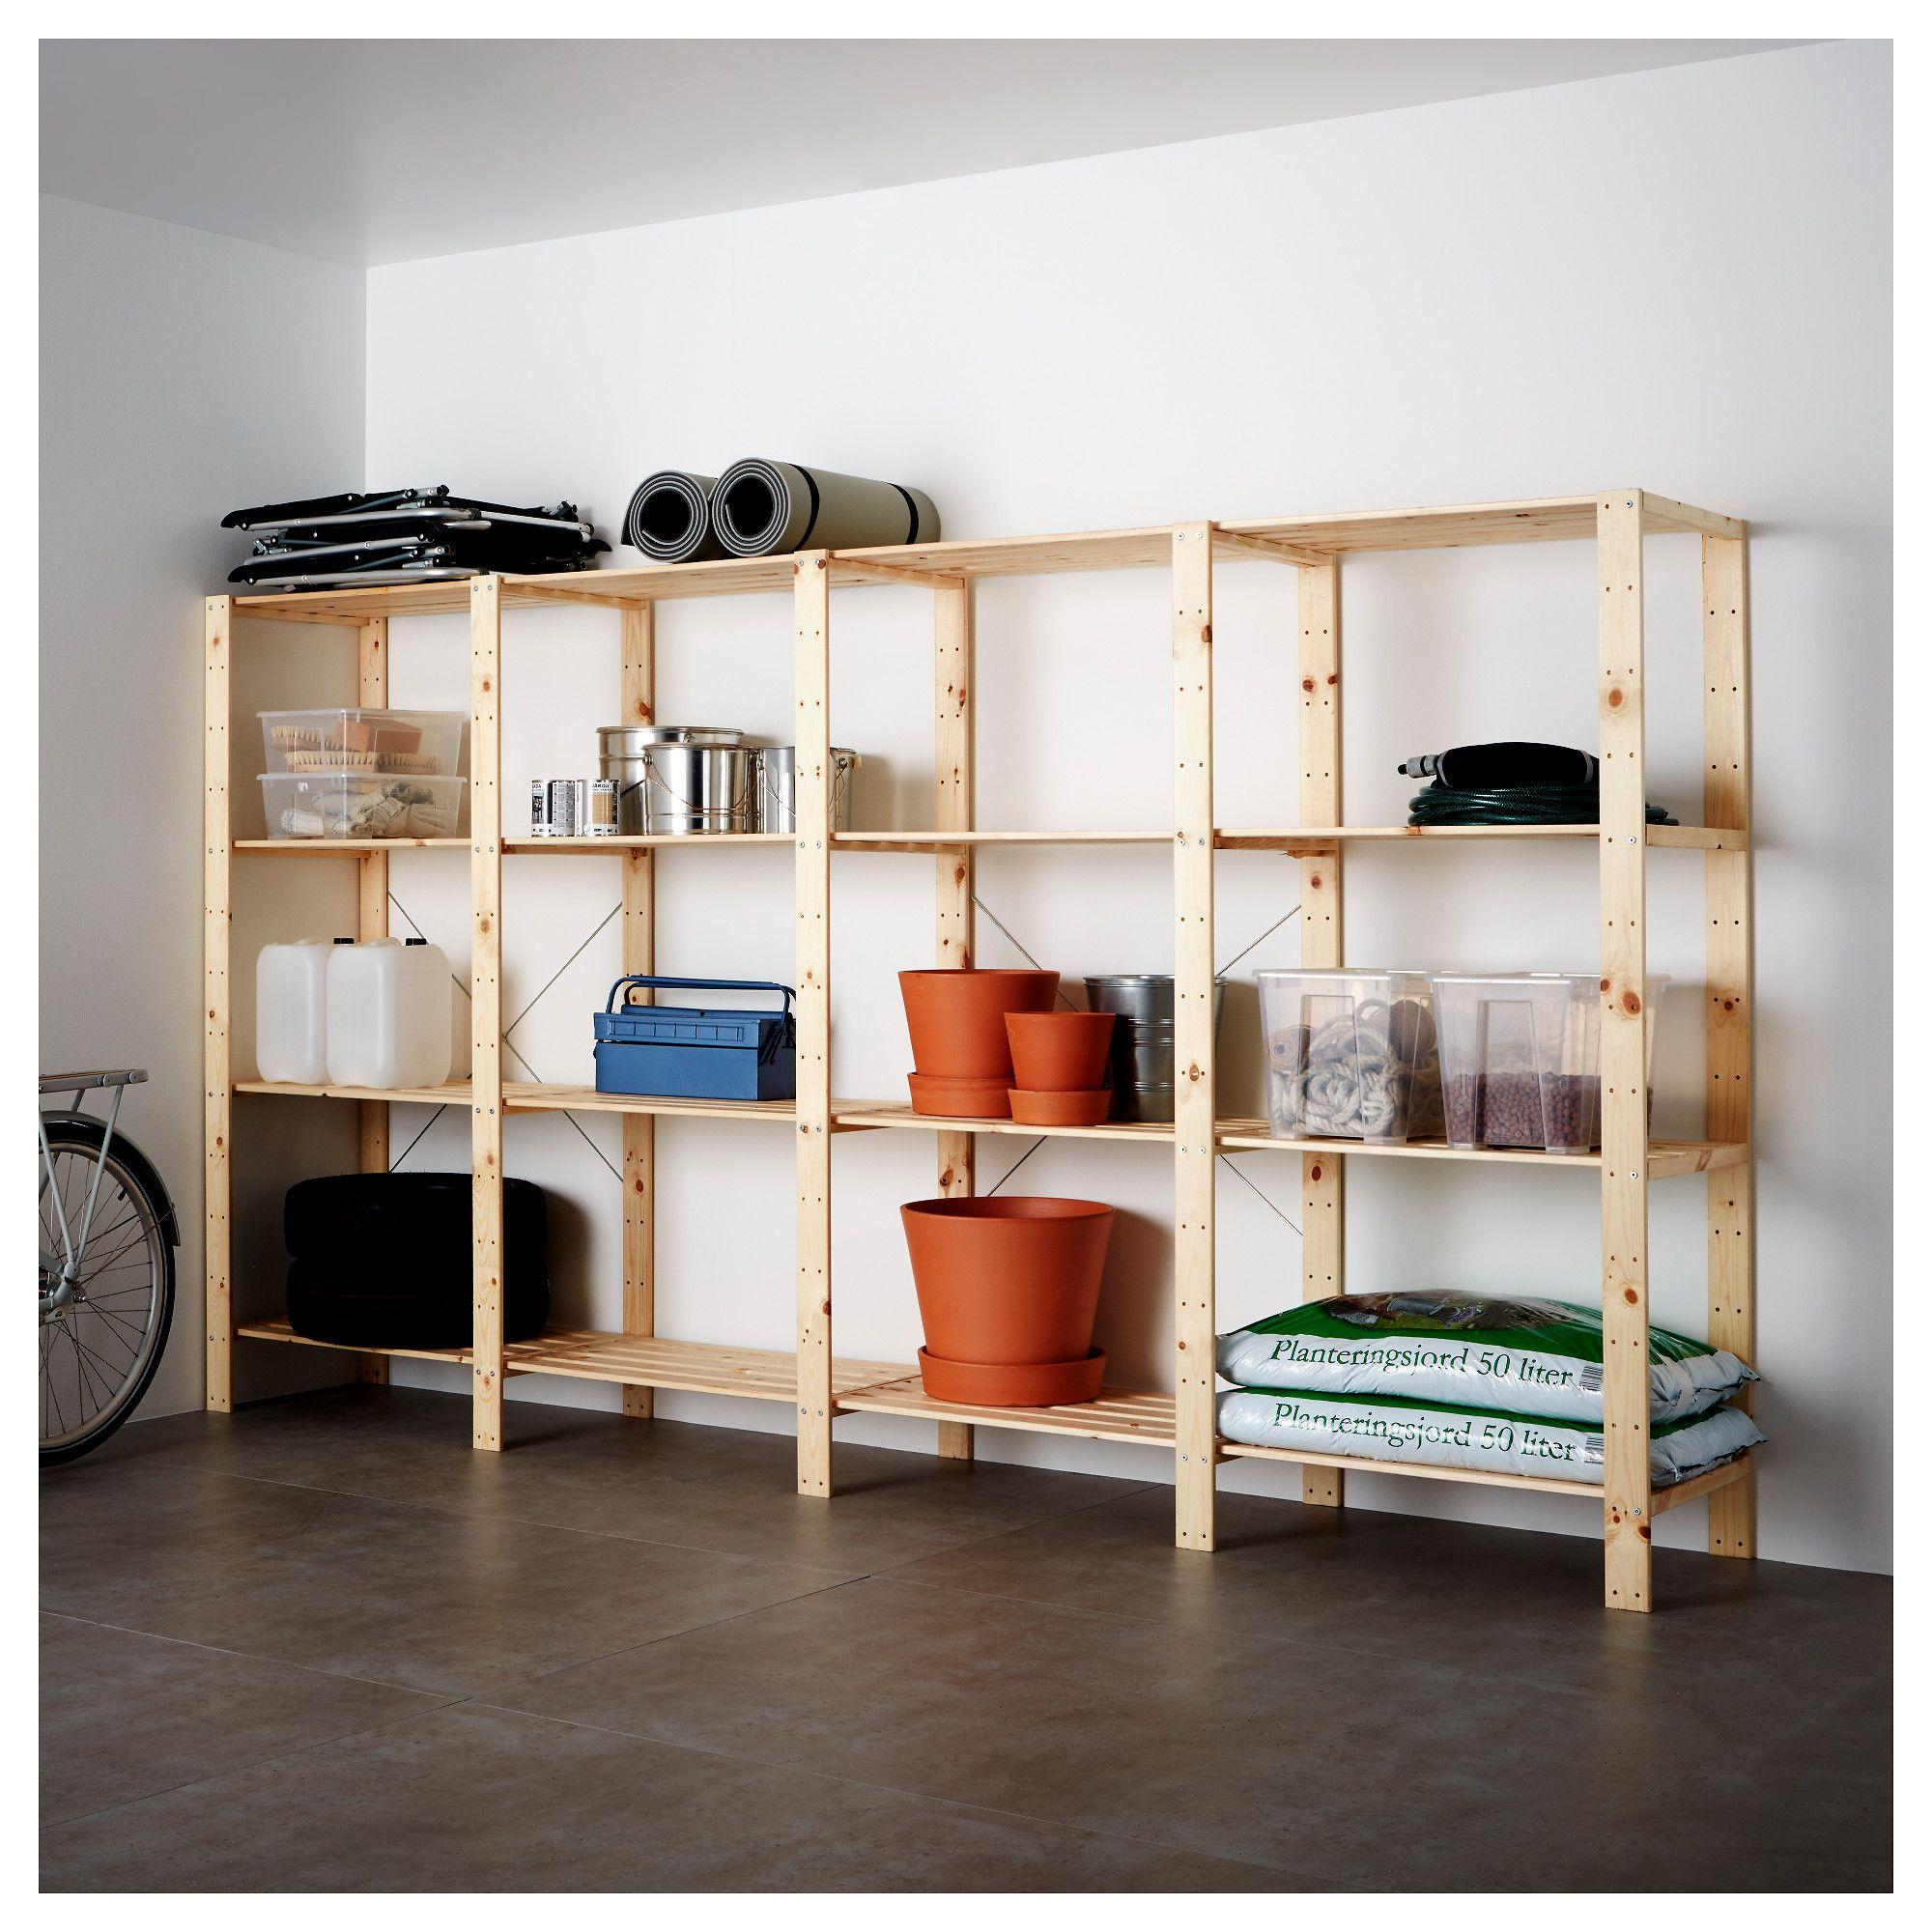 Hejne 4 Section Shelving Unit Softwood 120 7 8x19 5 8x67 3 8 Ikea Shelving Unit Shelving Ikea Hejne